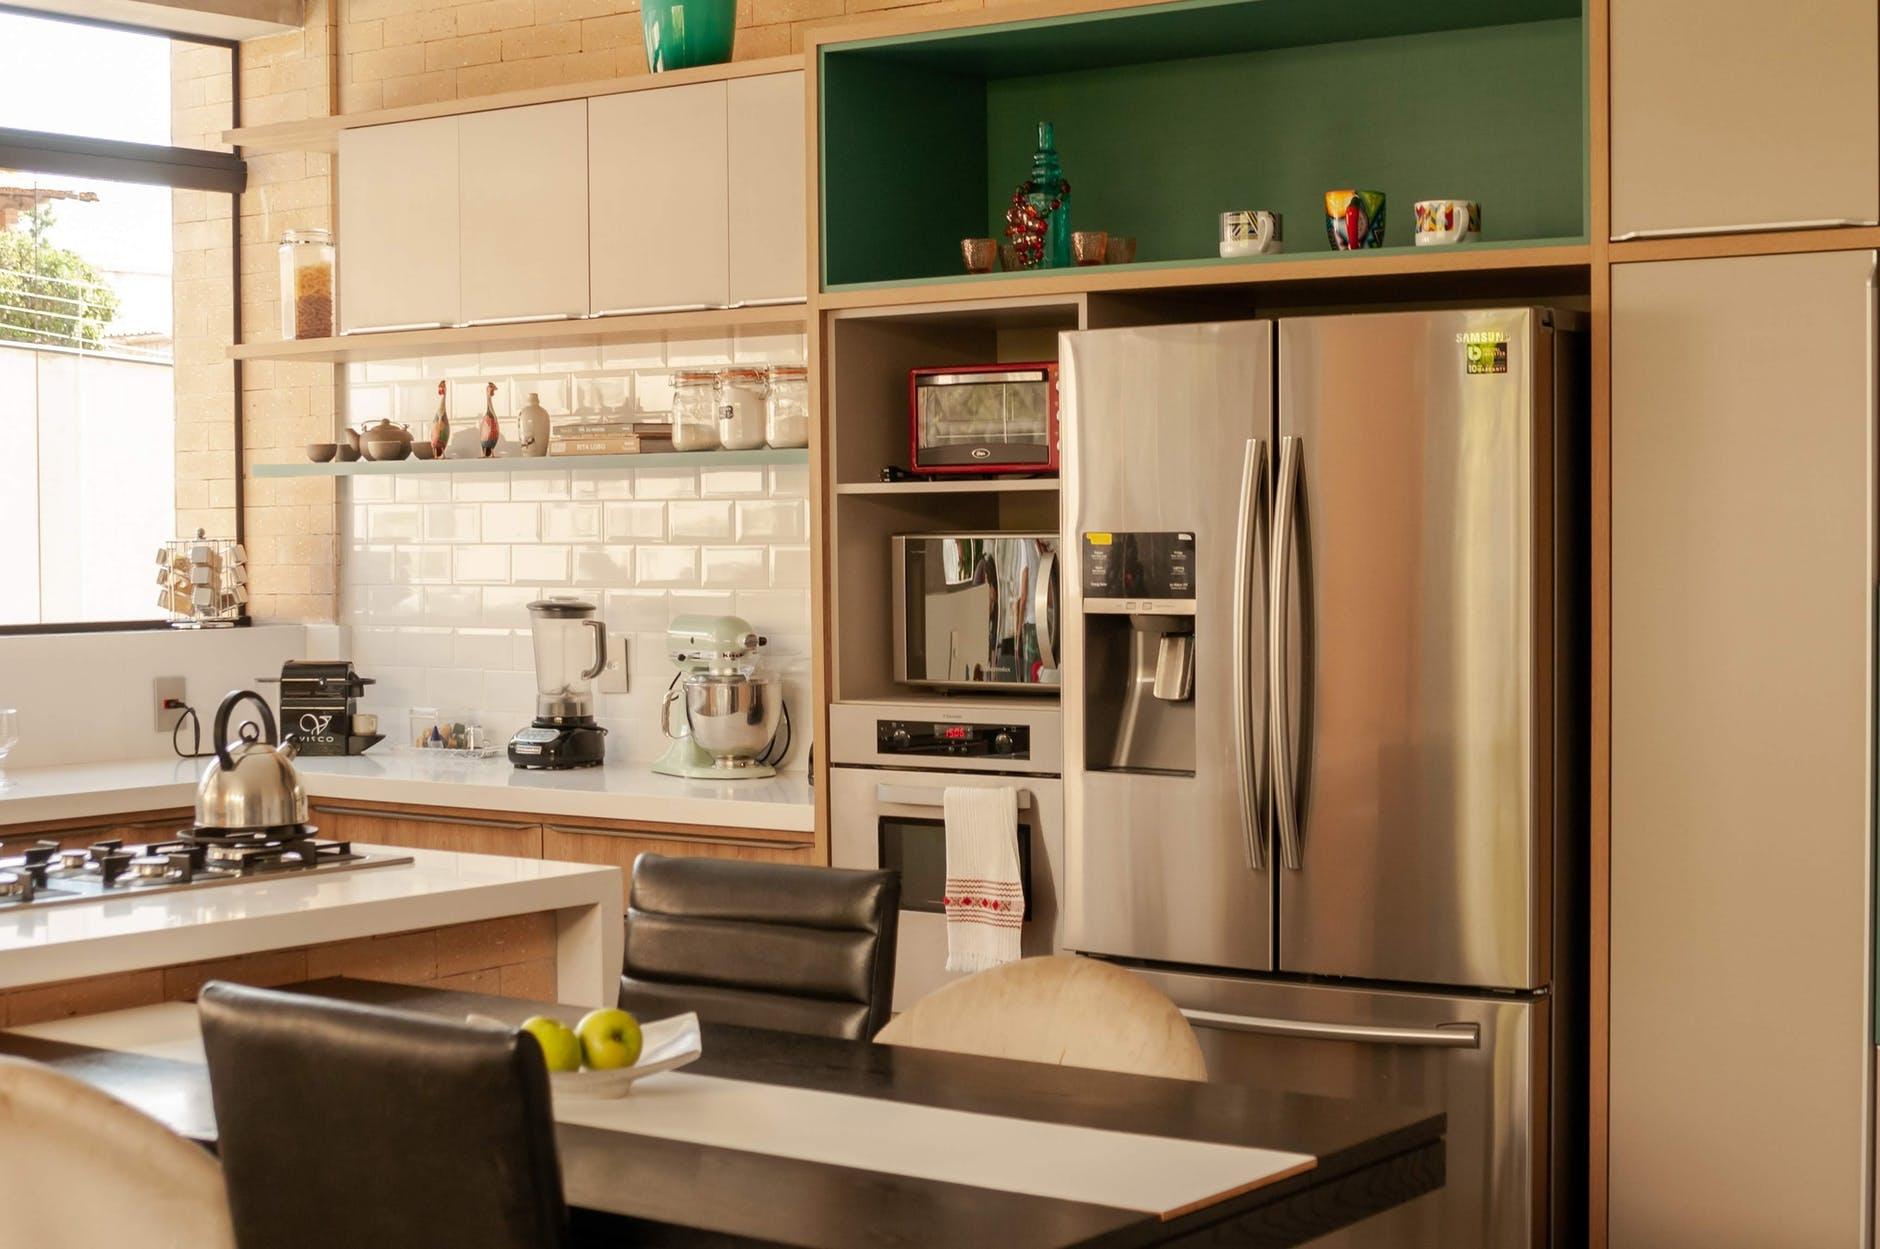 Refrigerator Pro (@refrigeratorproin) Cover Image